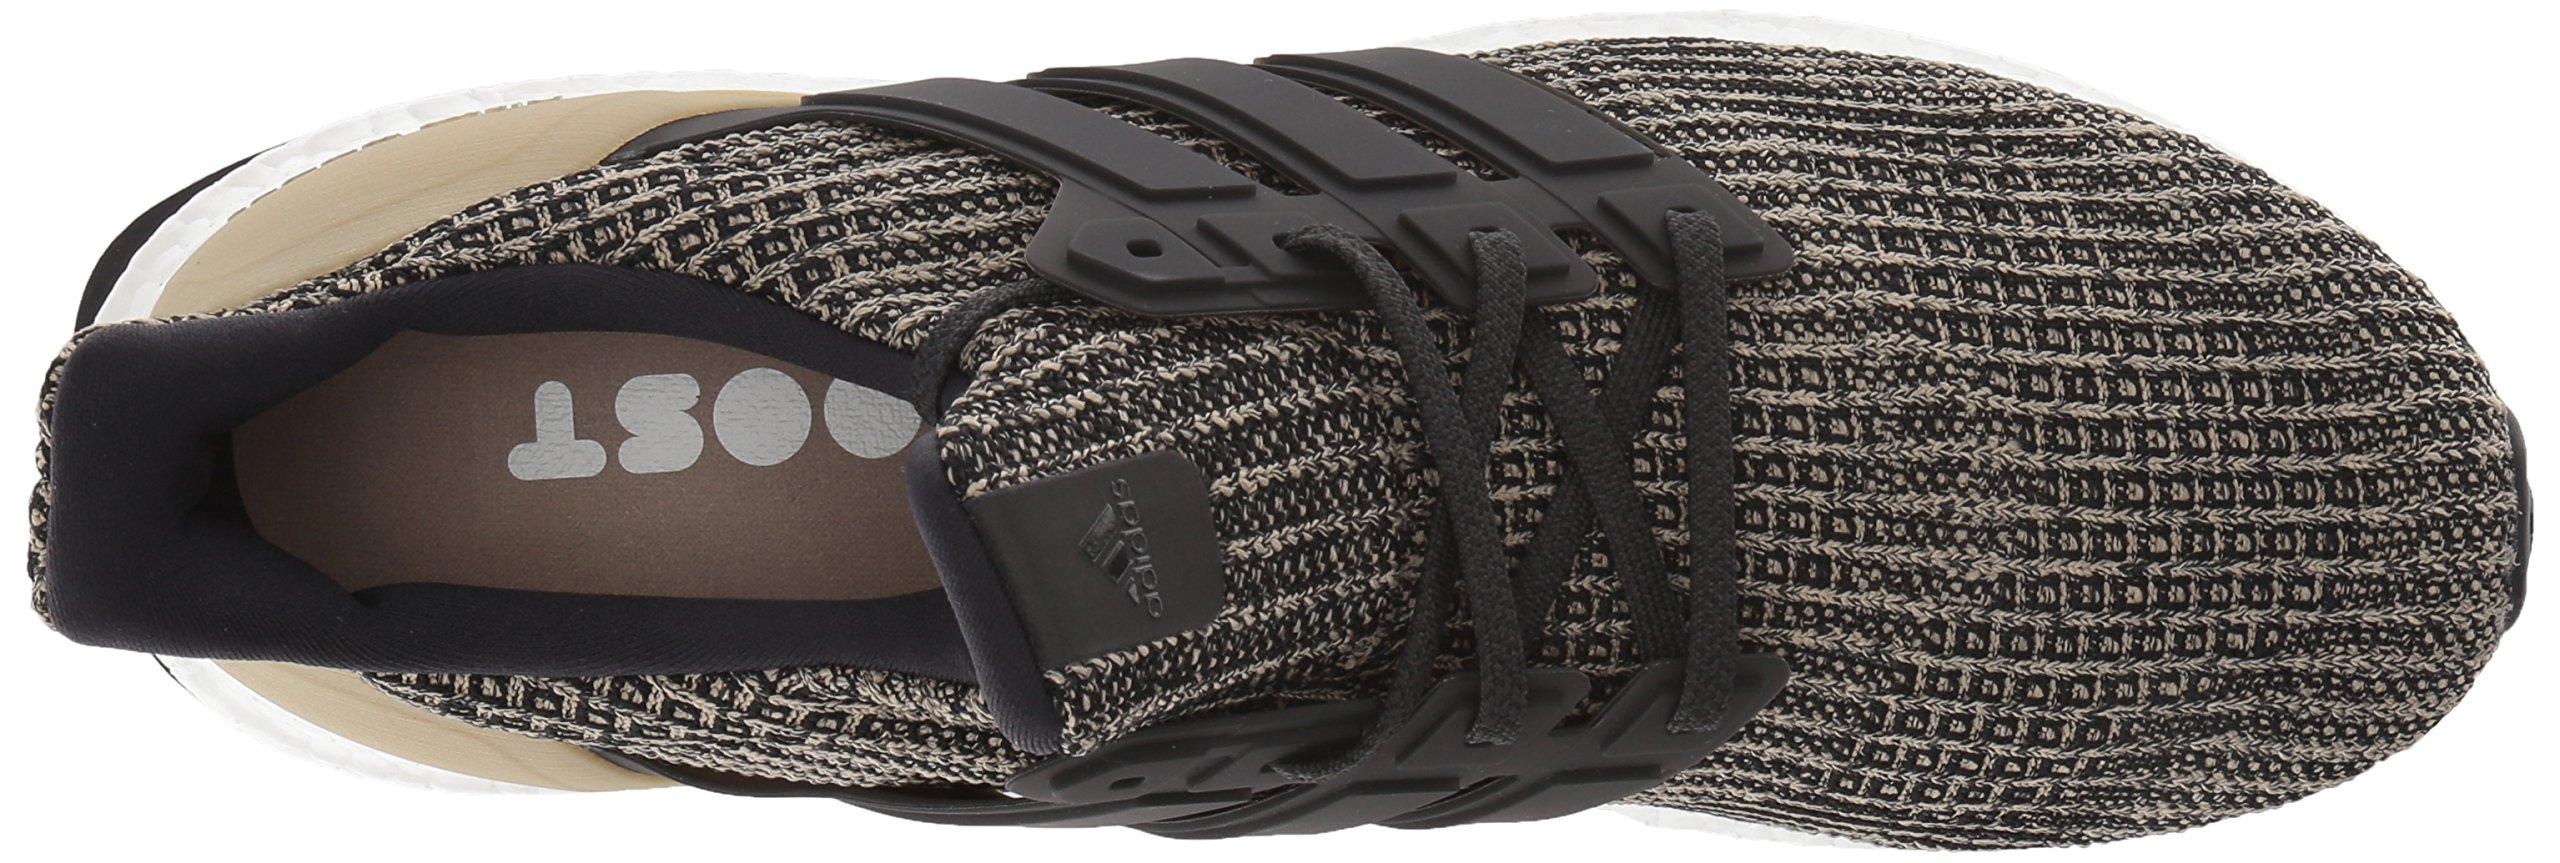 adidas Men's Ultraboost, Black/raw Gold, 6.5 M US by adidas (Image #7)